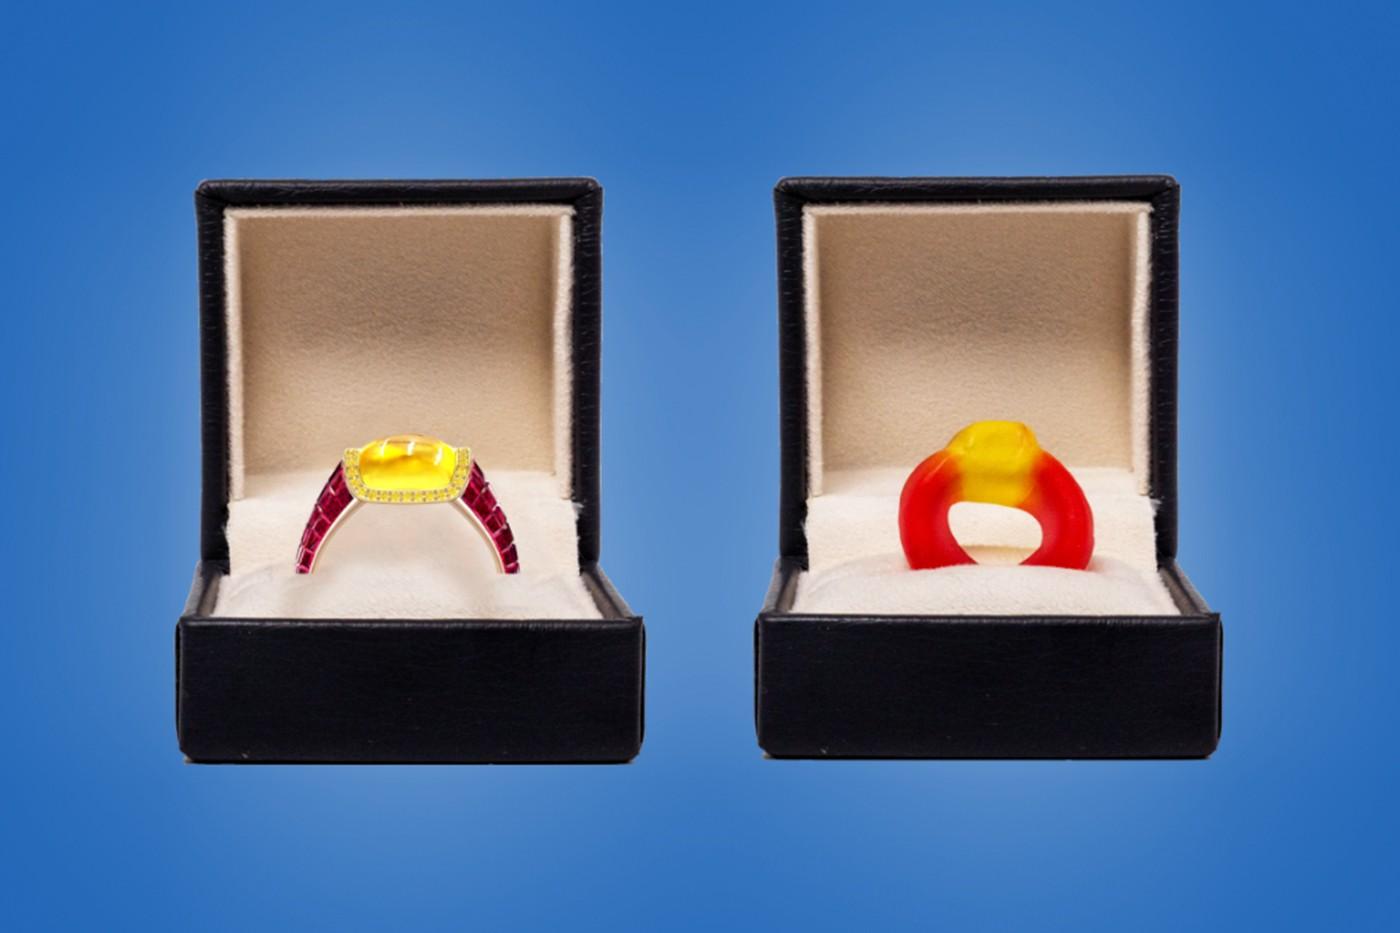 Bala de gelatina vira luxuoso anel de noivado